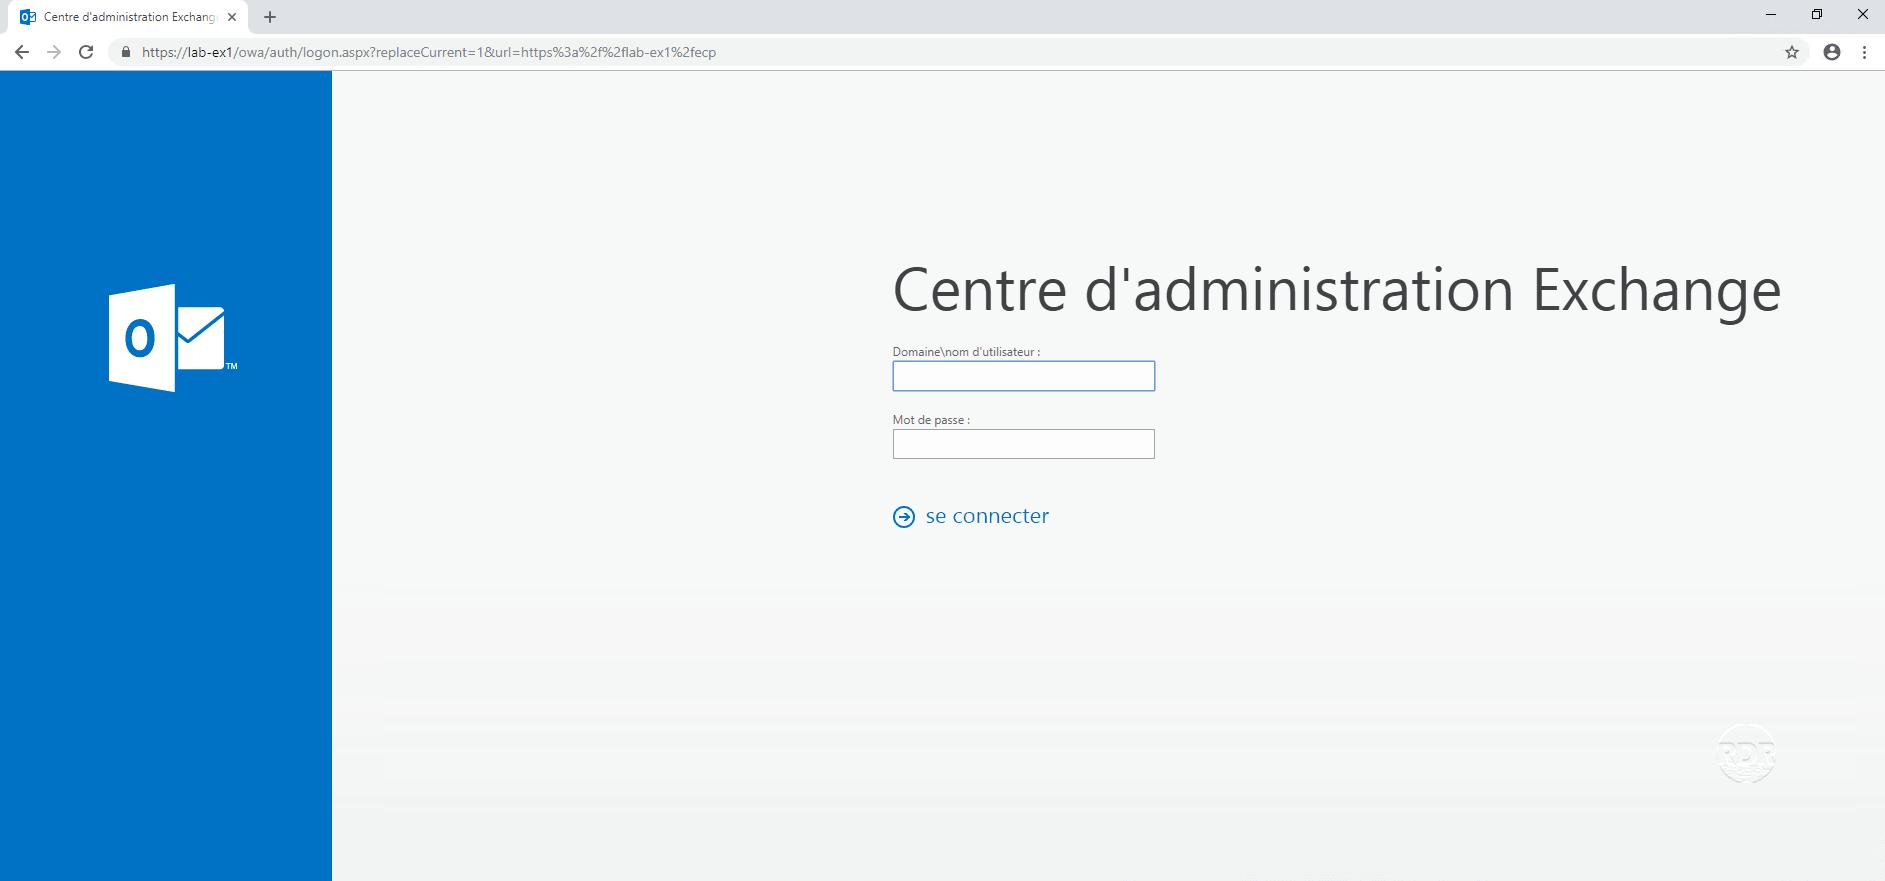 Exchange 2016 - page de connexion